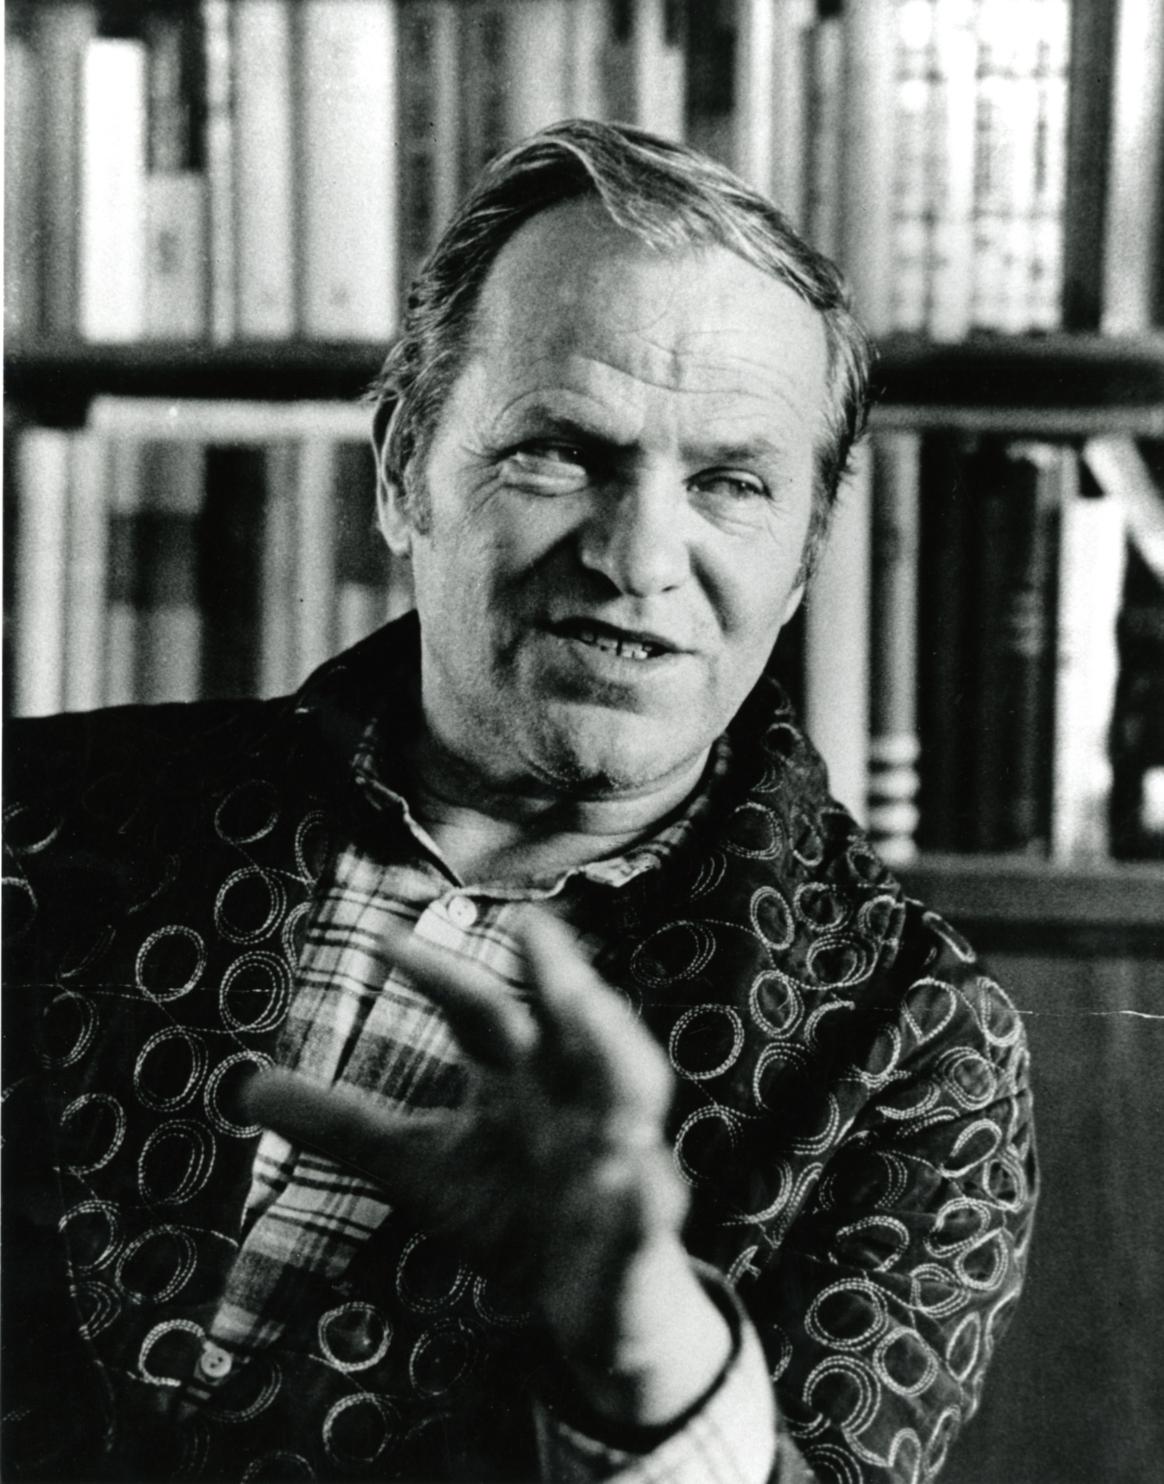 Milan Šimečka